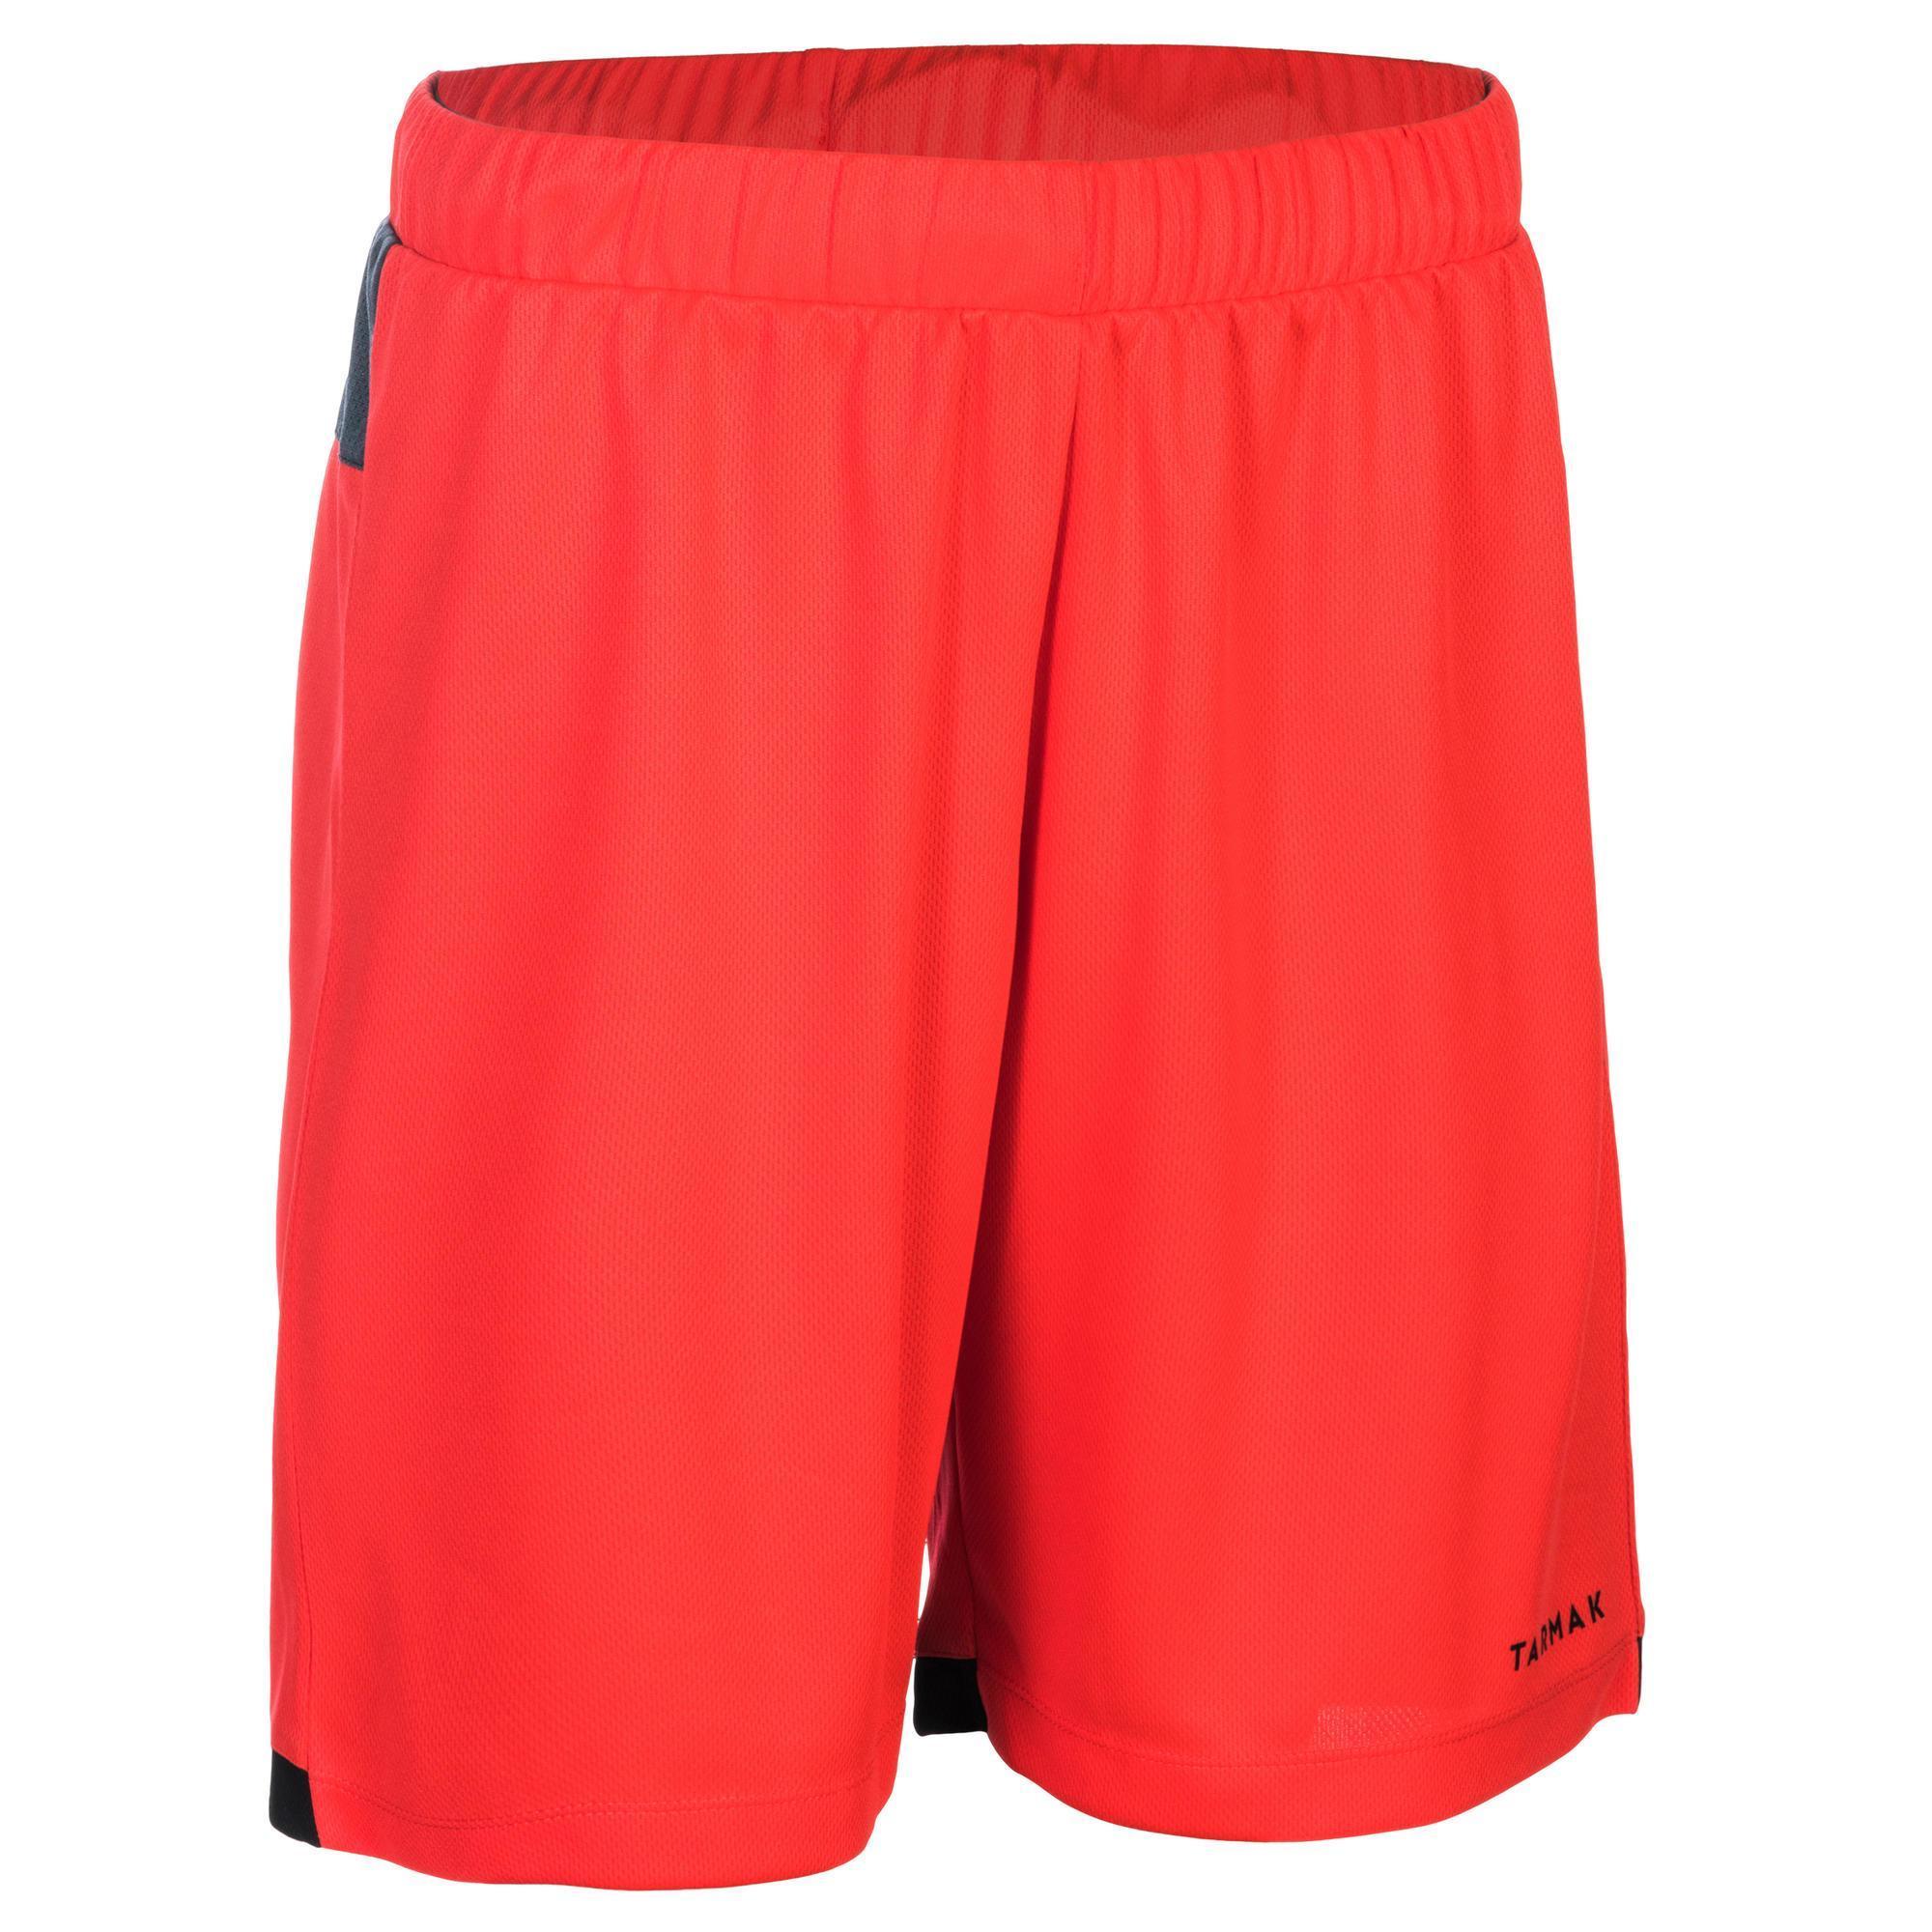 Basketballshorts SH500 Damen Fortgeschrittene rot/schwarz/grau | Sportbekleidung > Sporthosen > Basketballshorts | Rot - Grau - Blau - Schwarz | Tarmak